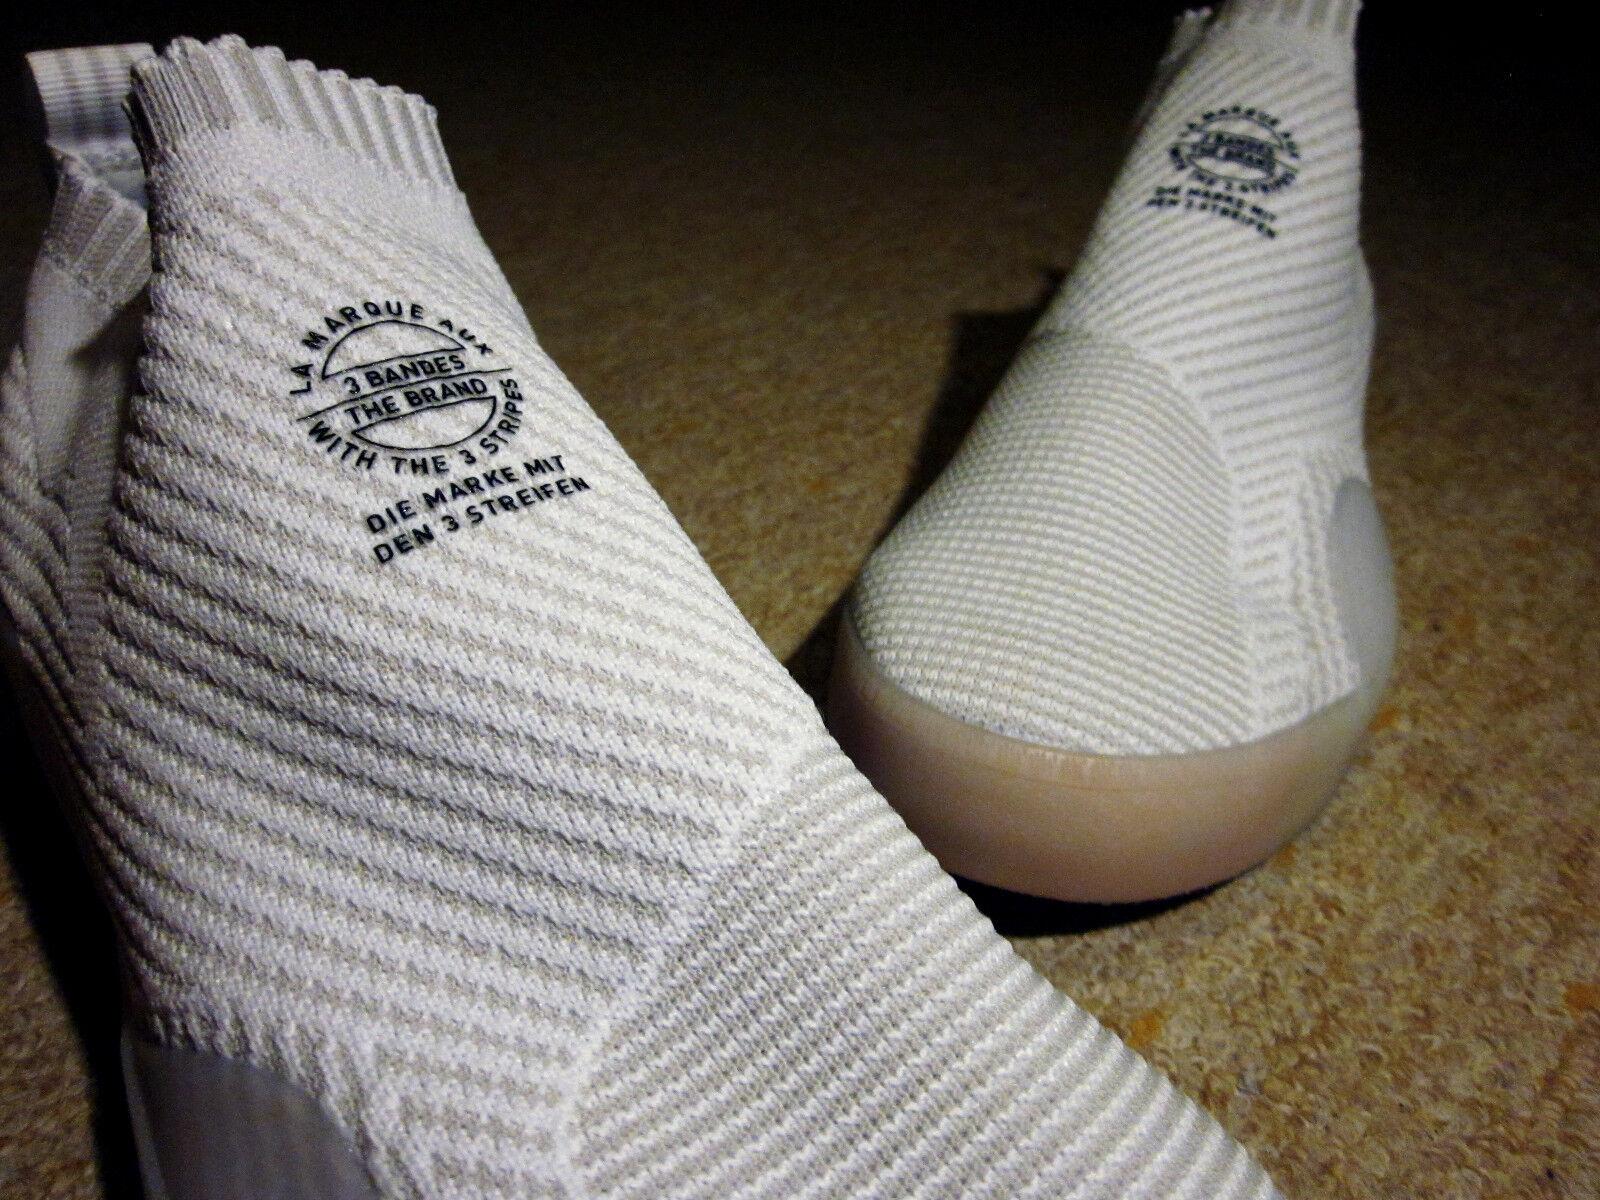 Adidas 3ST.002 PK Skateboarding-Schuhe - Herren (Größe 43 ⅔)